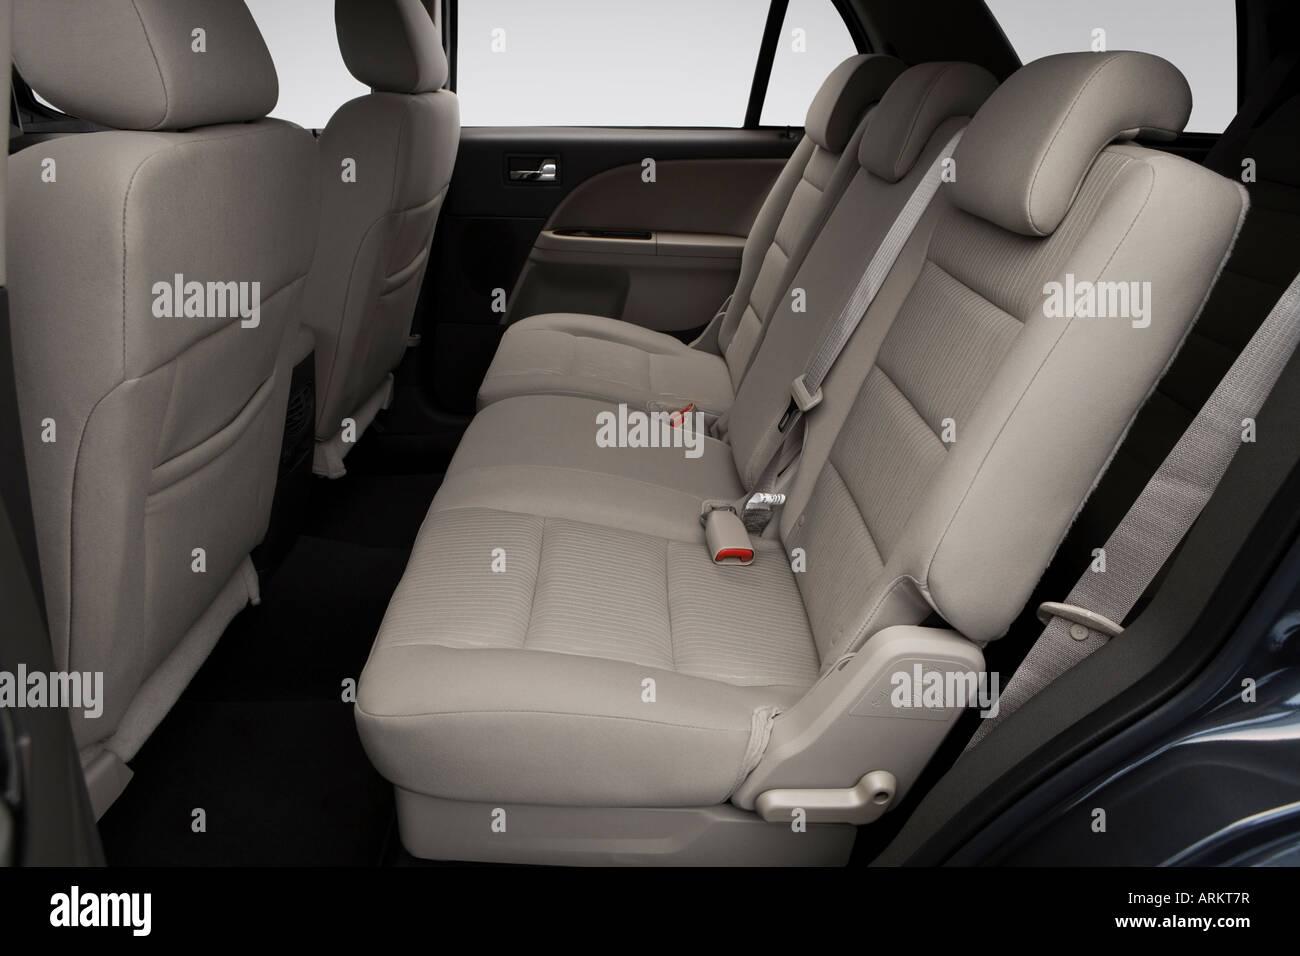 2008 ford taurus x sel in gray rear seats